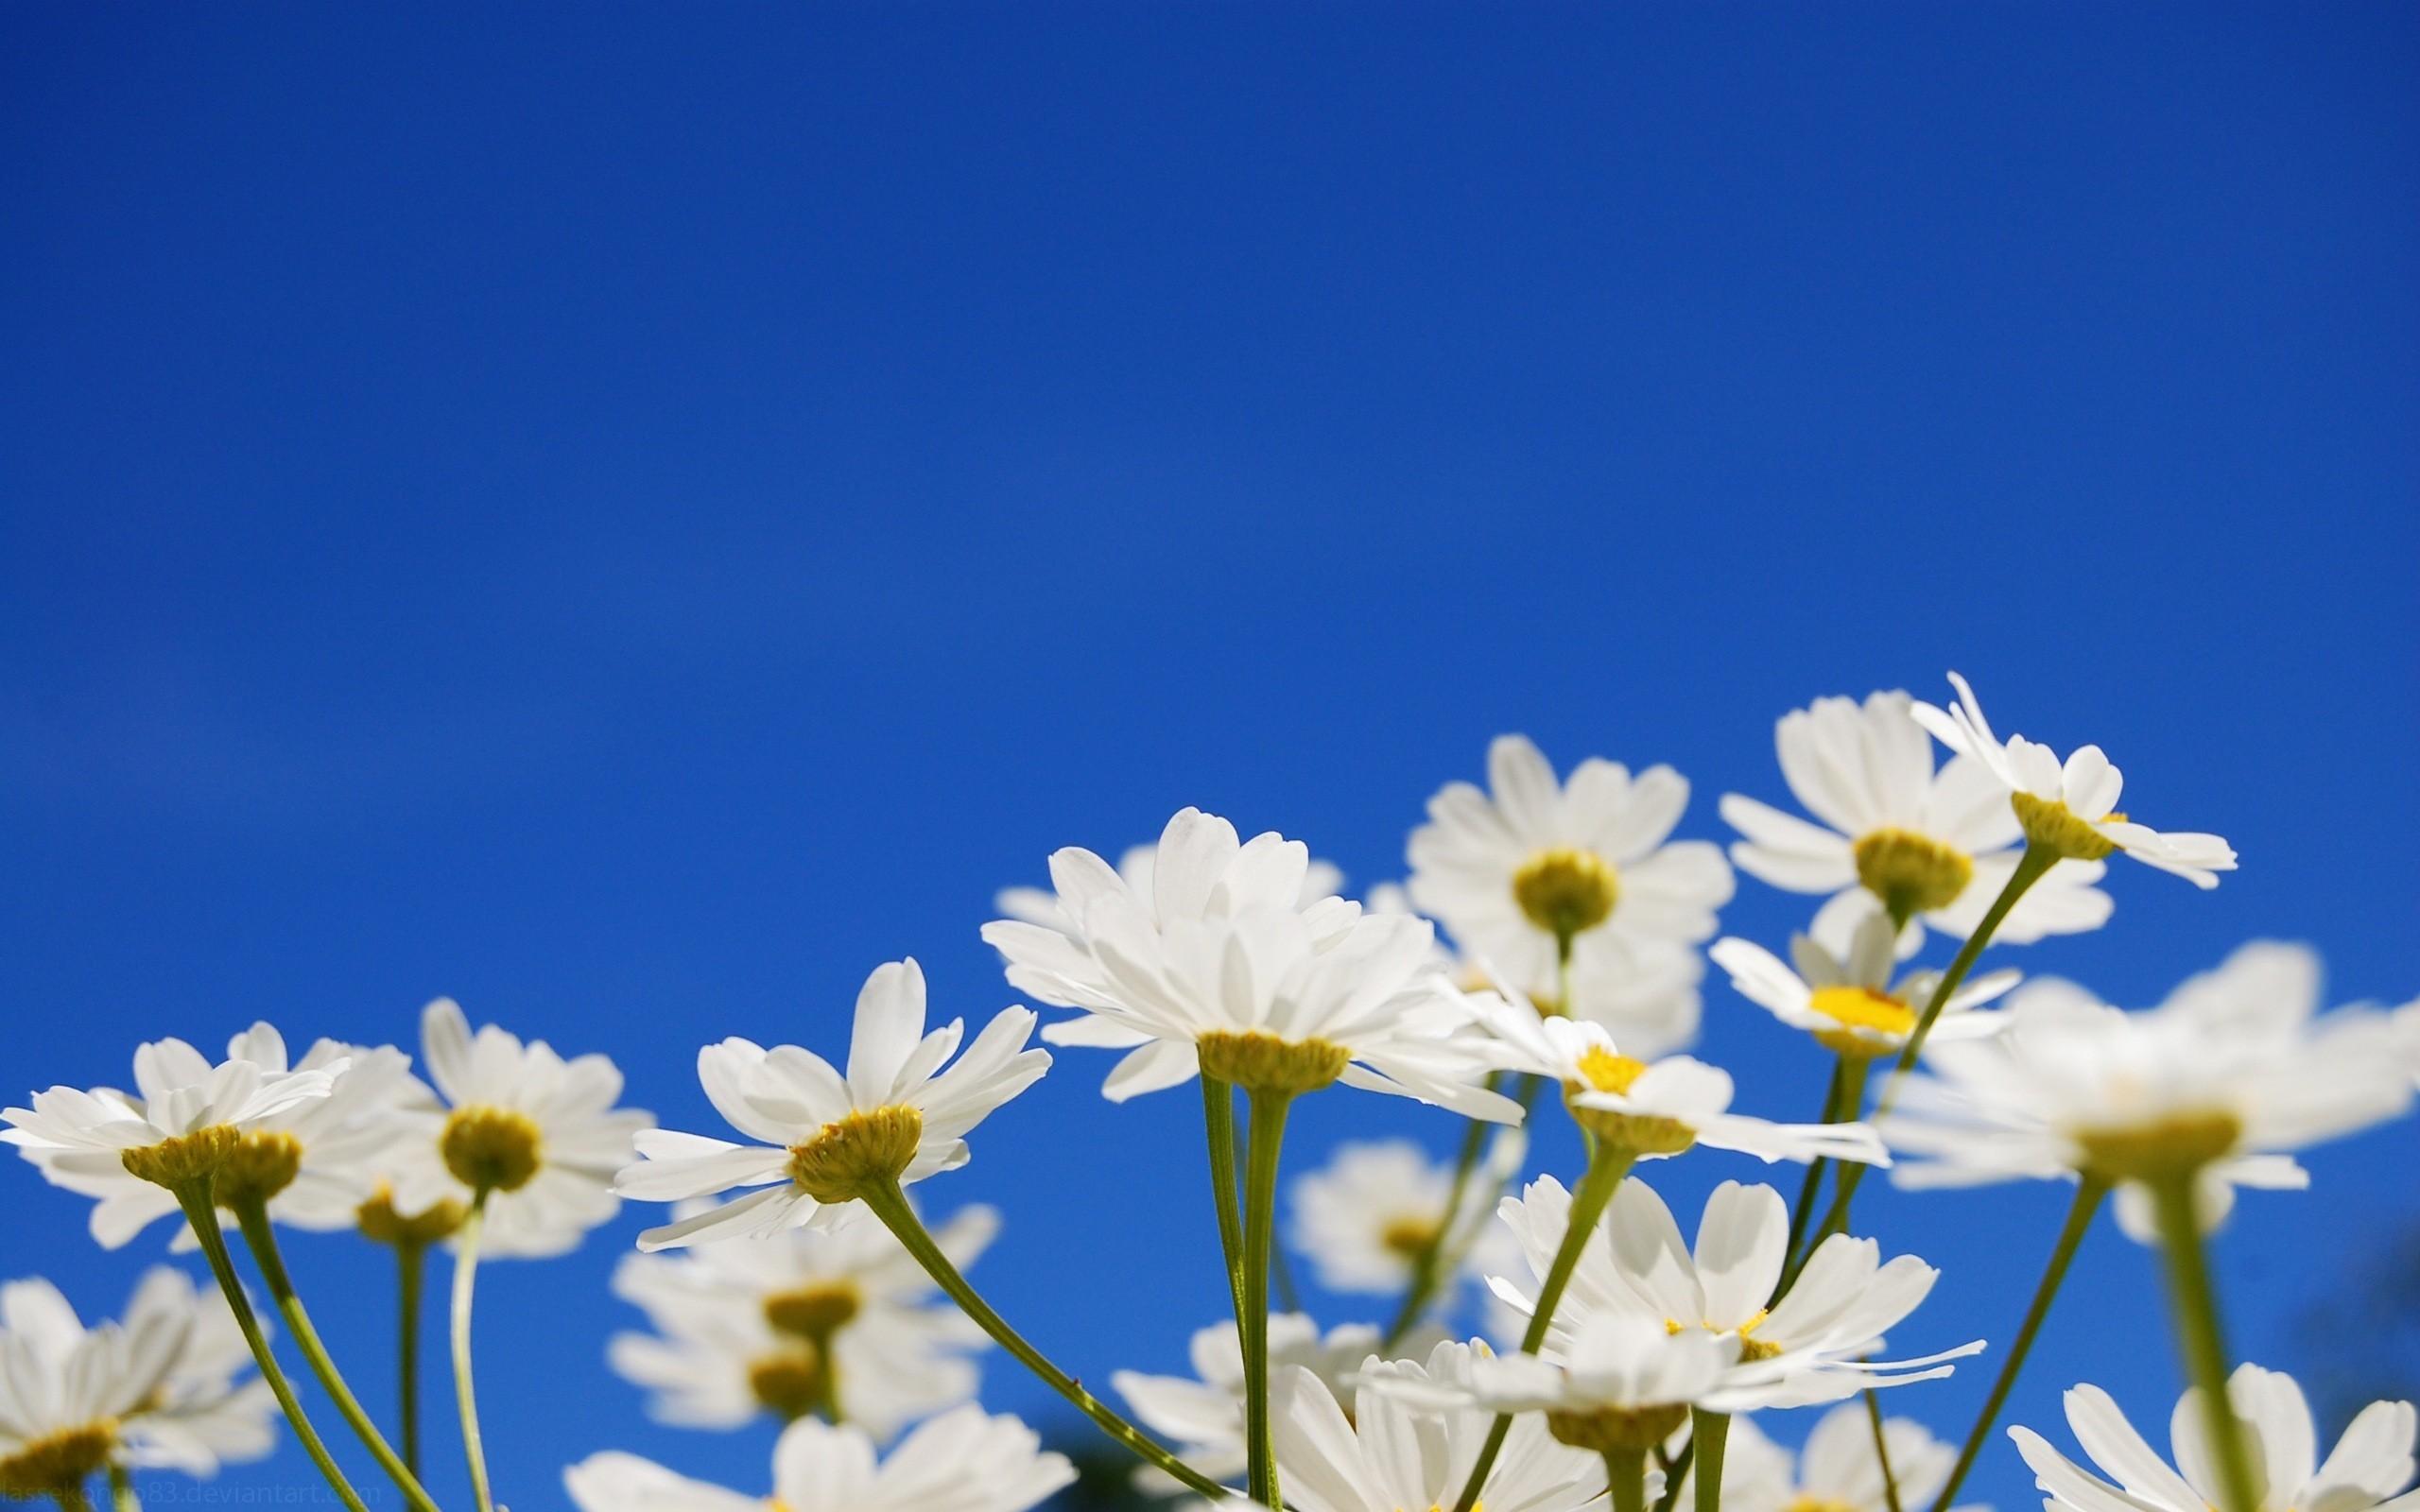 Flores blancas margaritas - 2560x1600